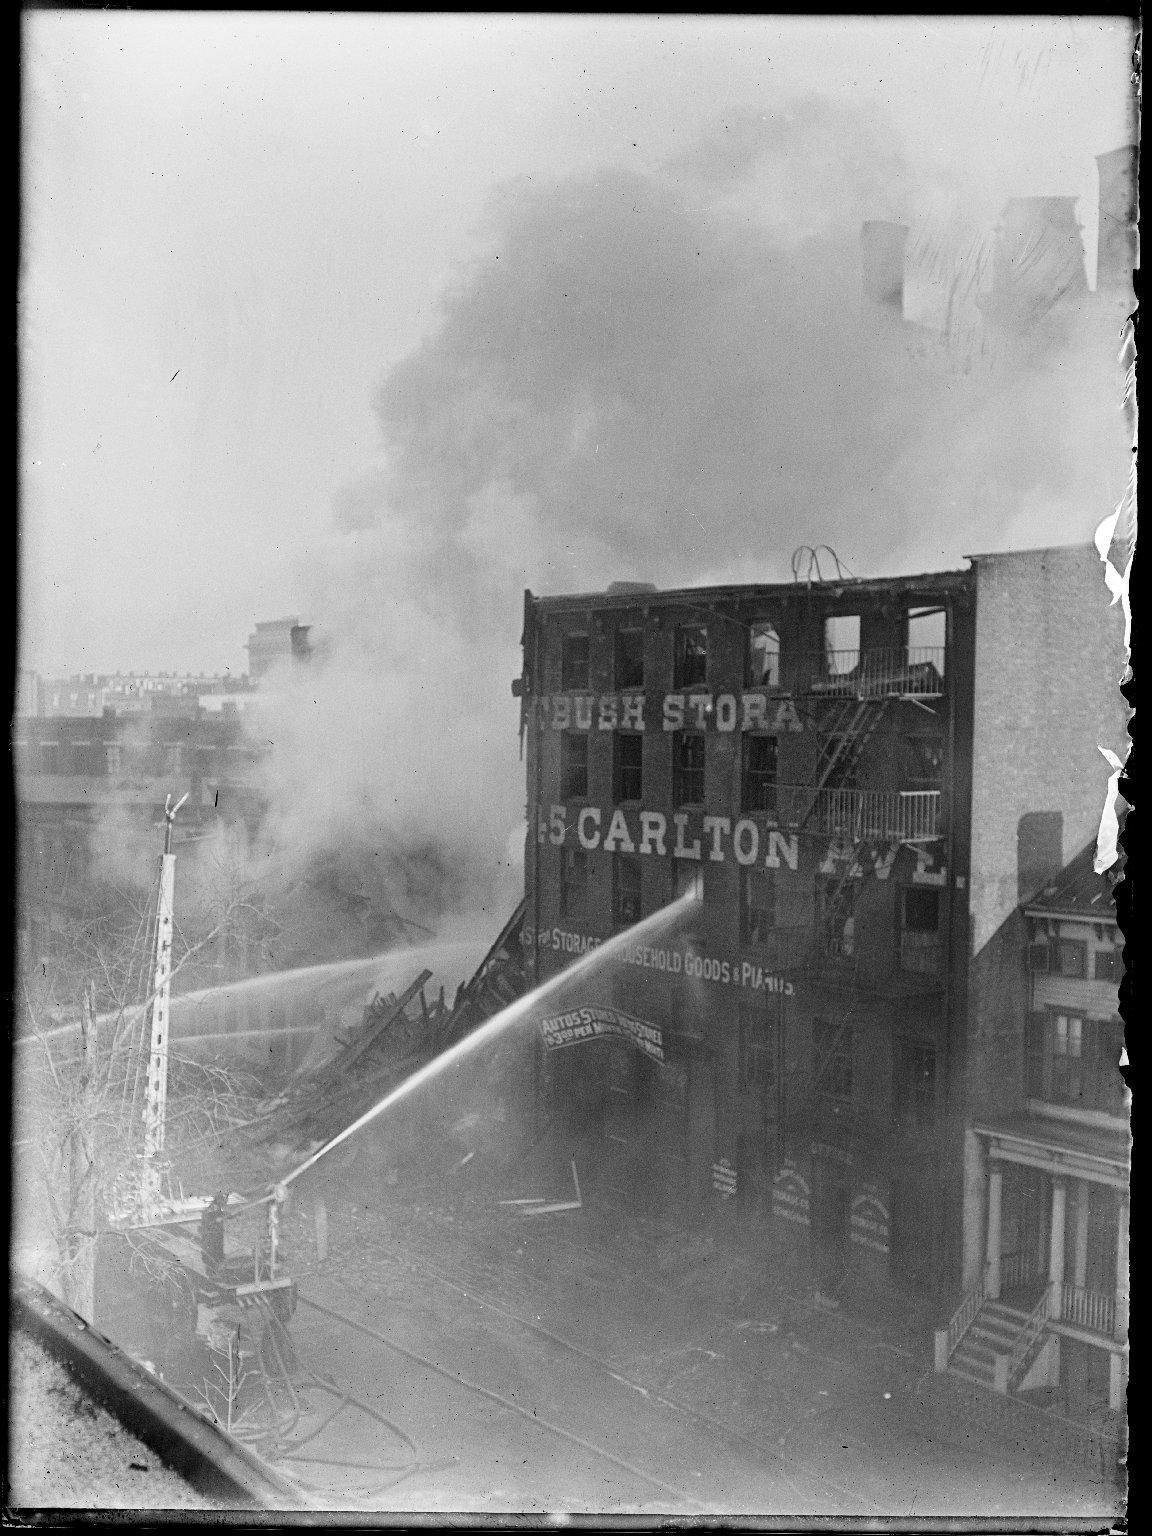 Пожар на складе Нью-Йорк, США. 1916 год